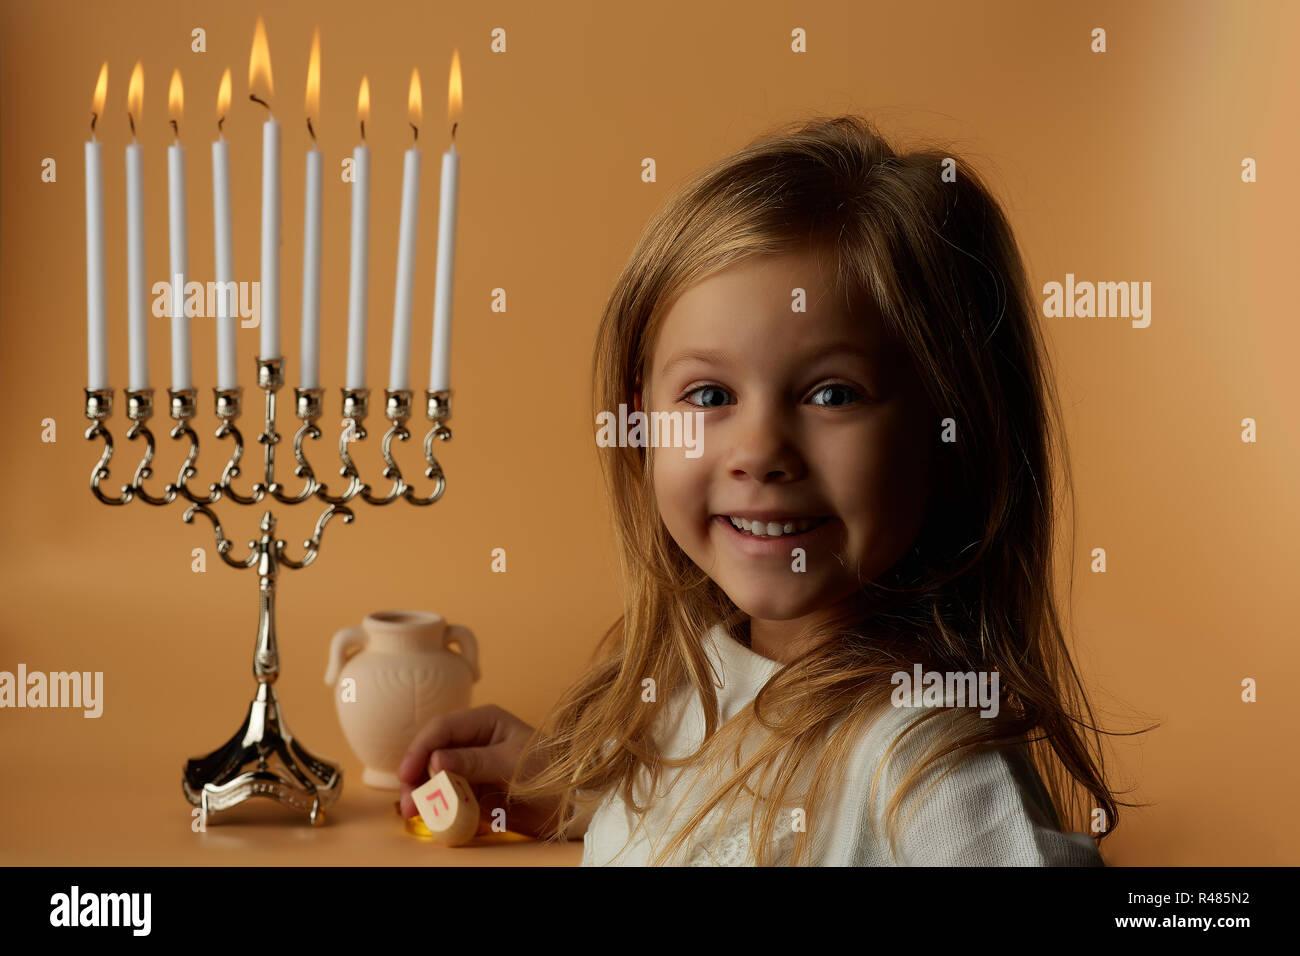 Hanukkah: Little girl on the background of candles Hanukkah - Stock Image